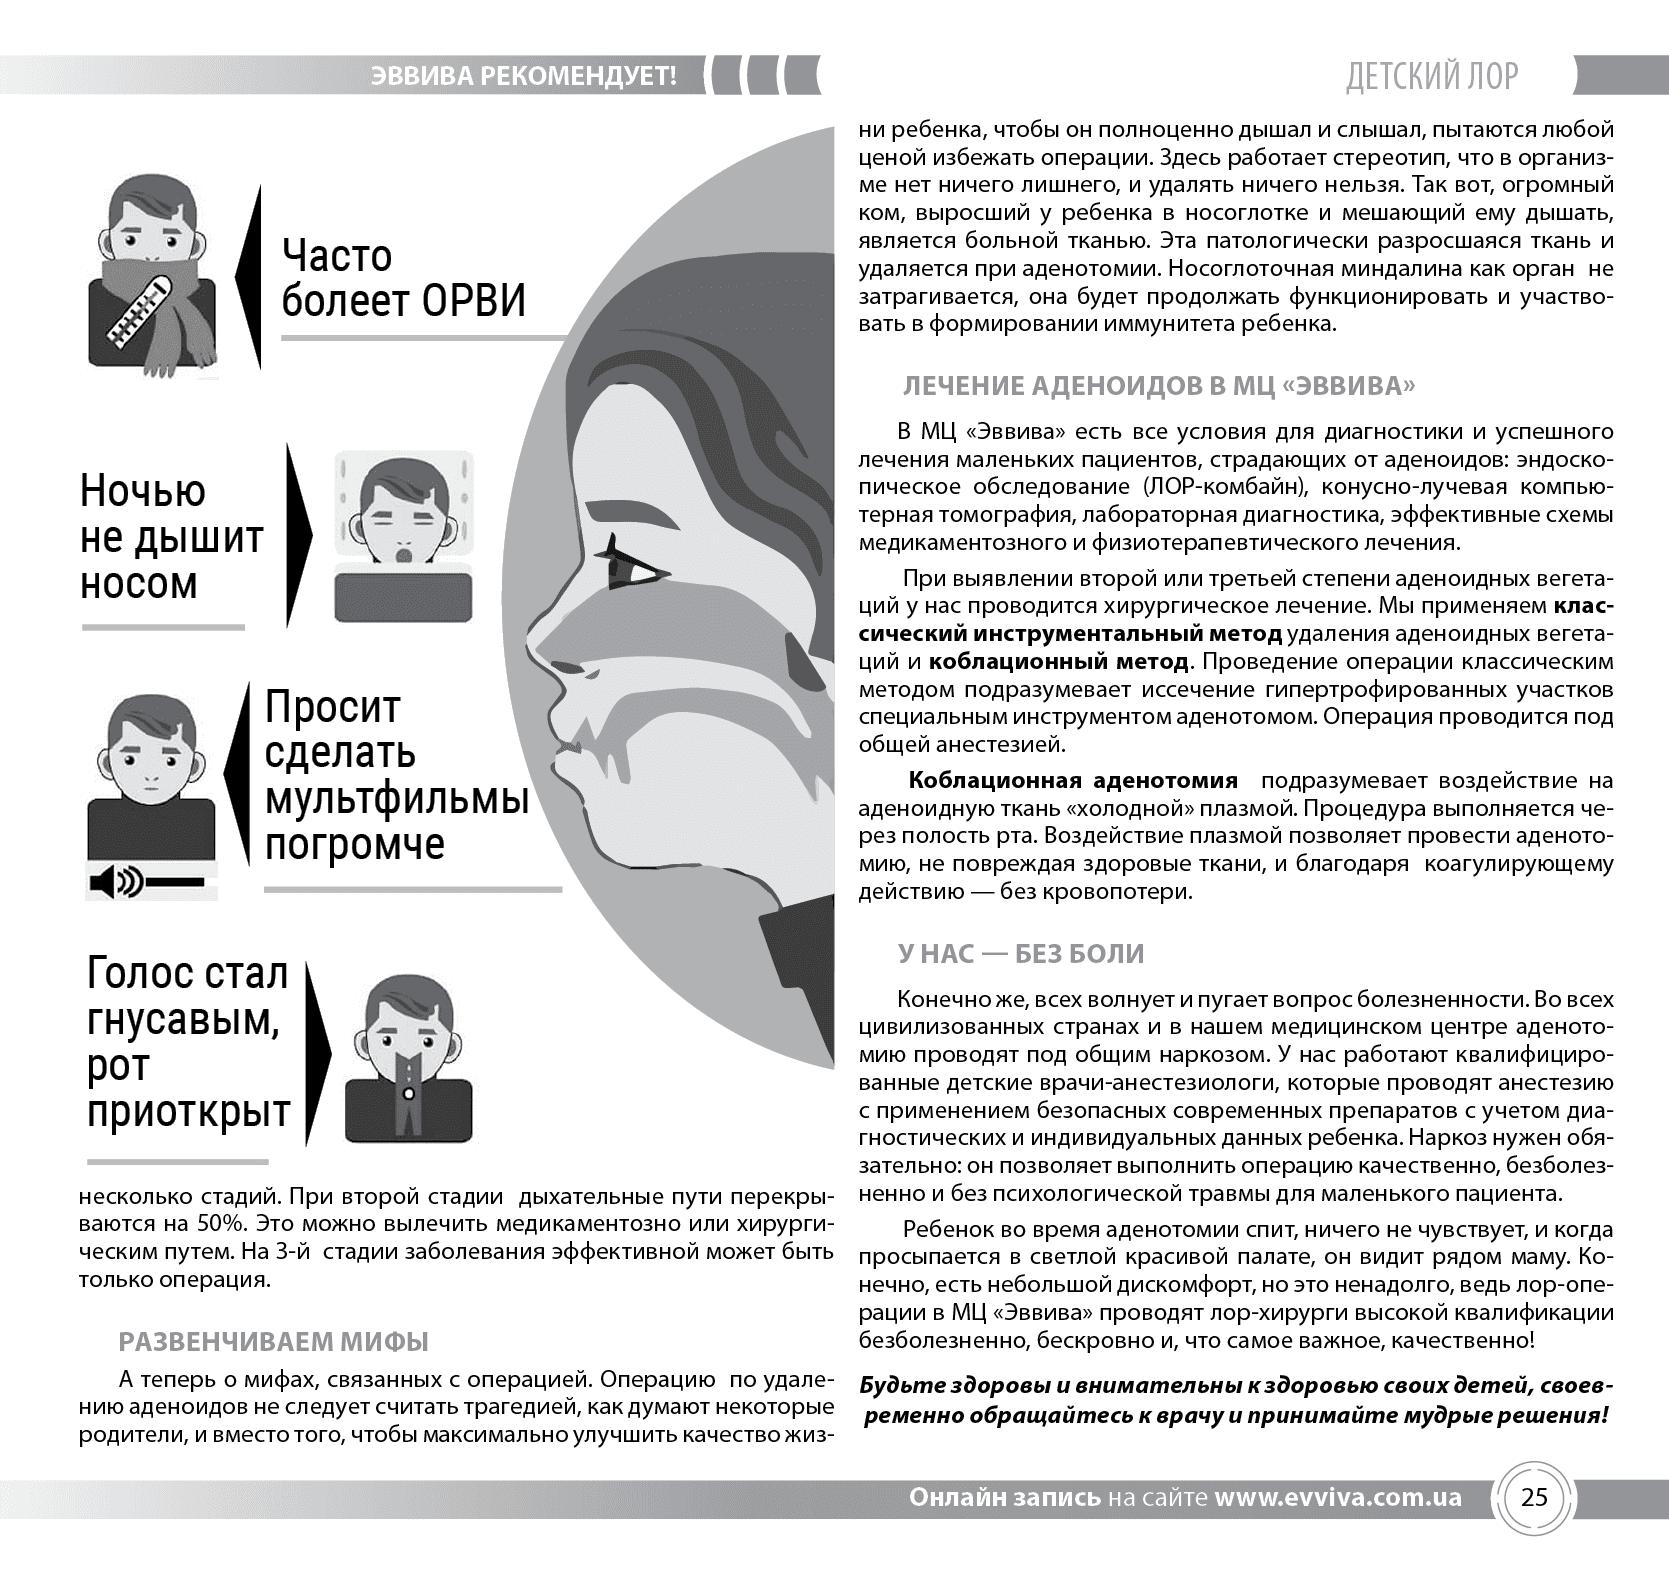 evviva-zhurnal-118-page25